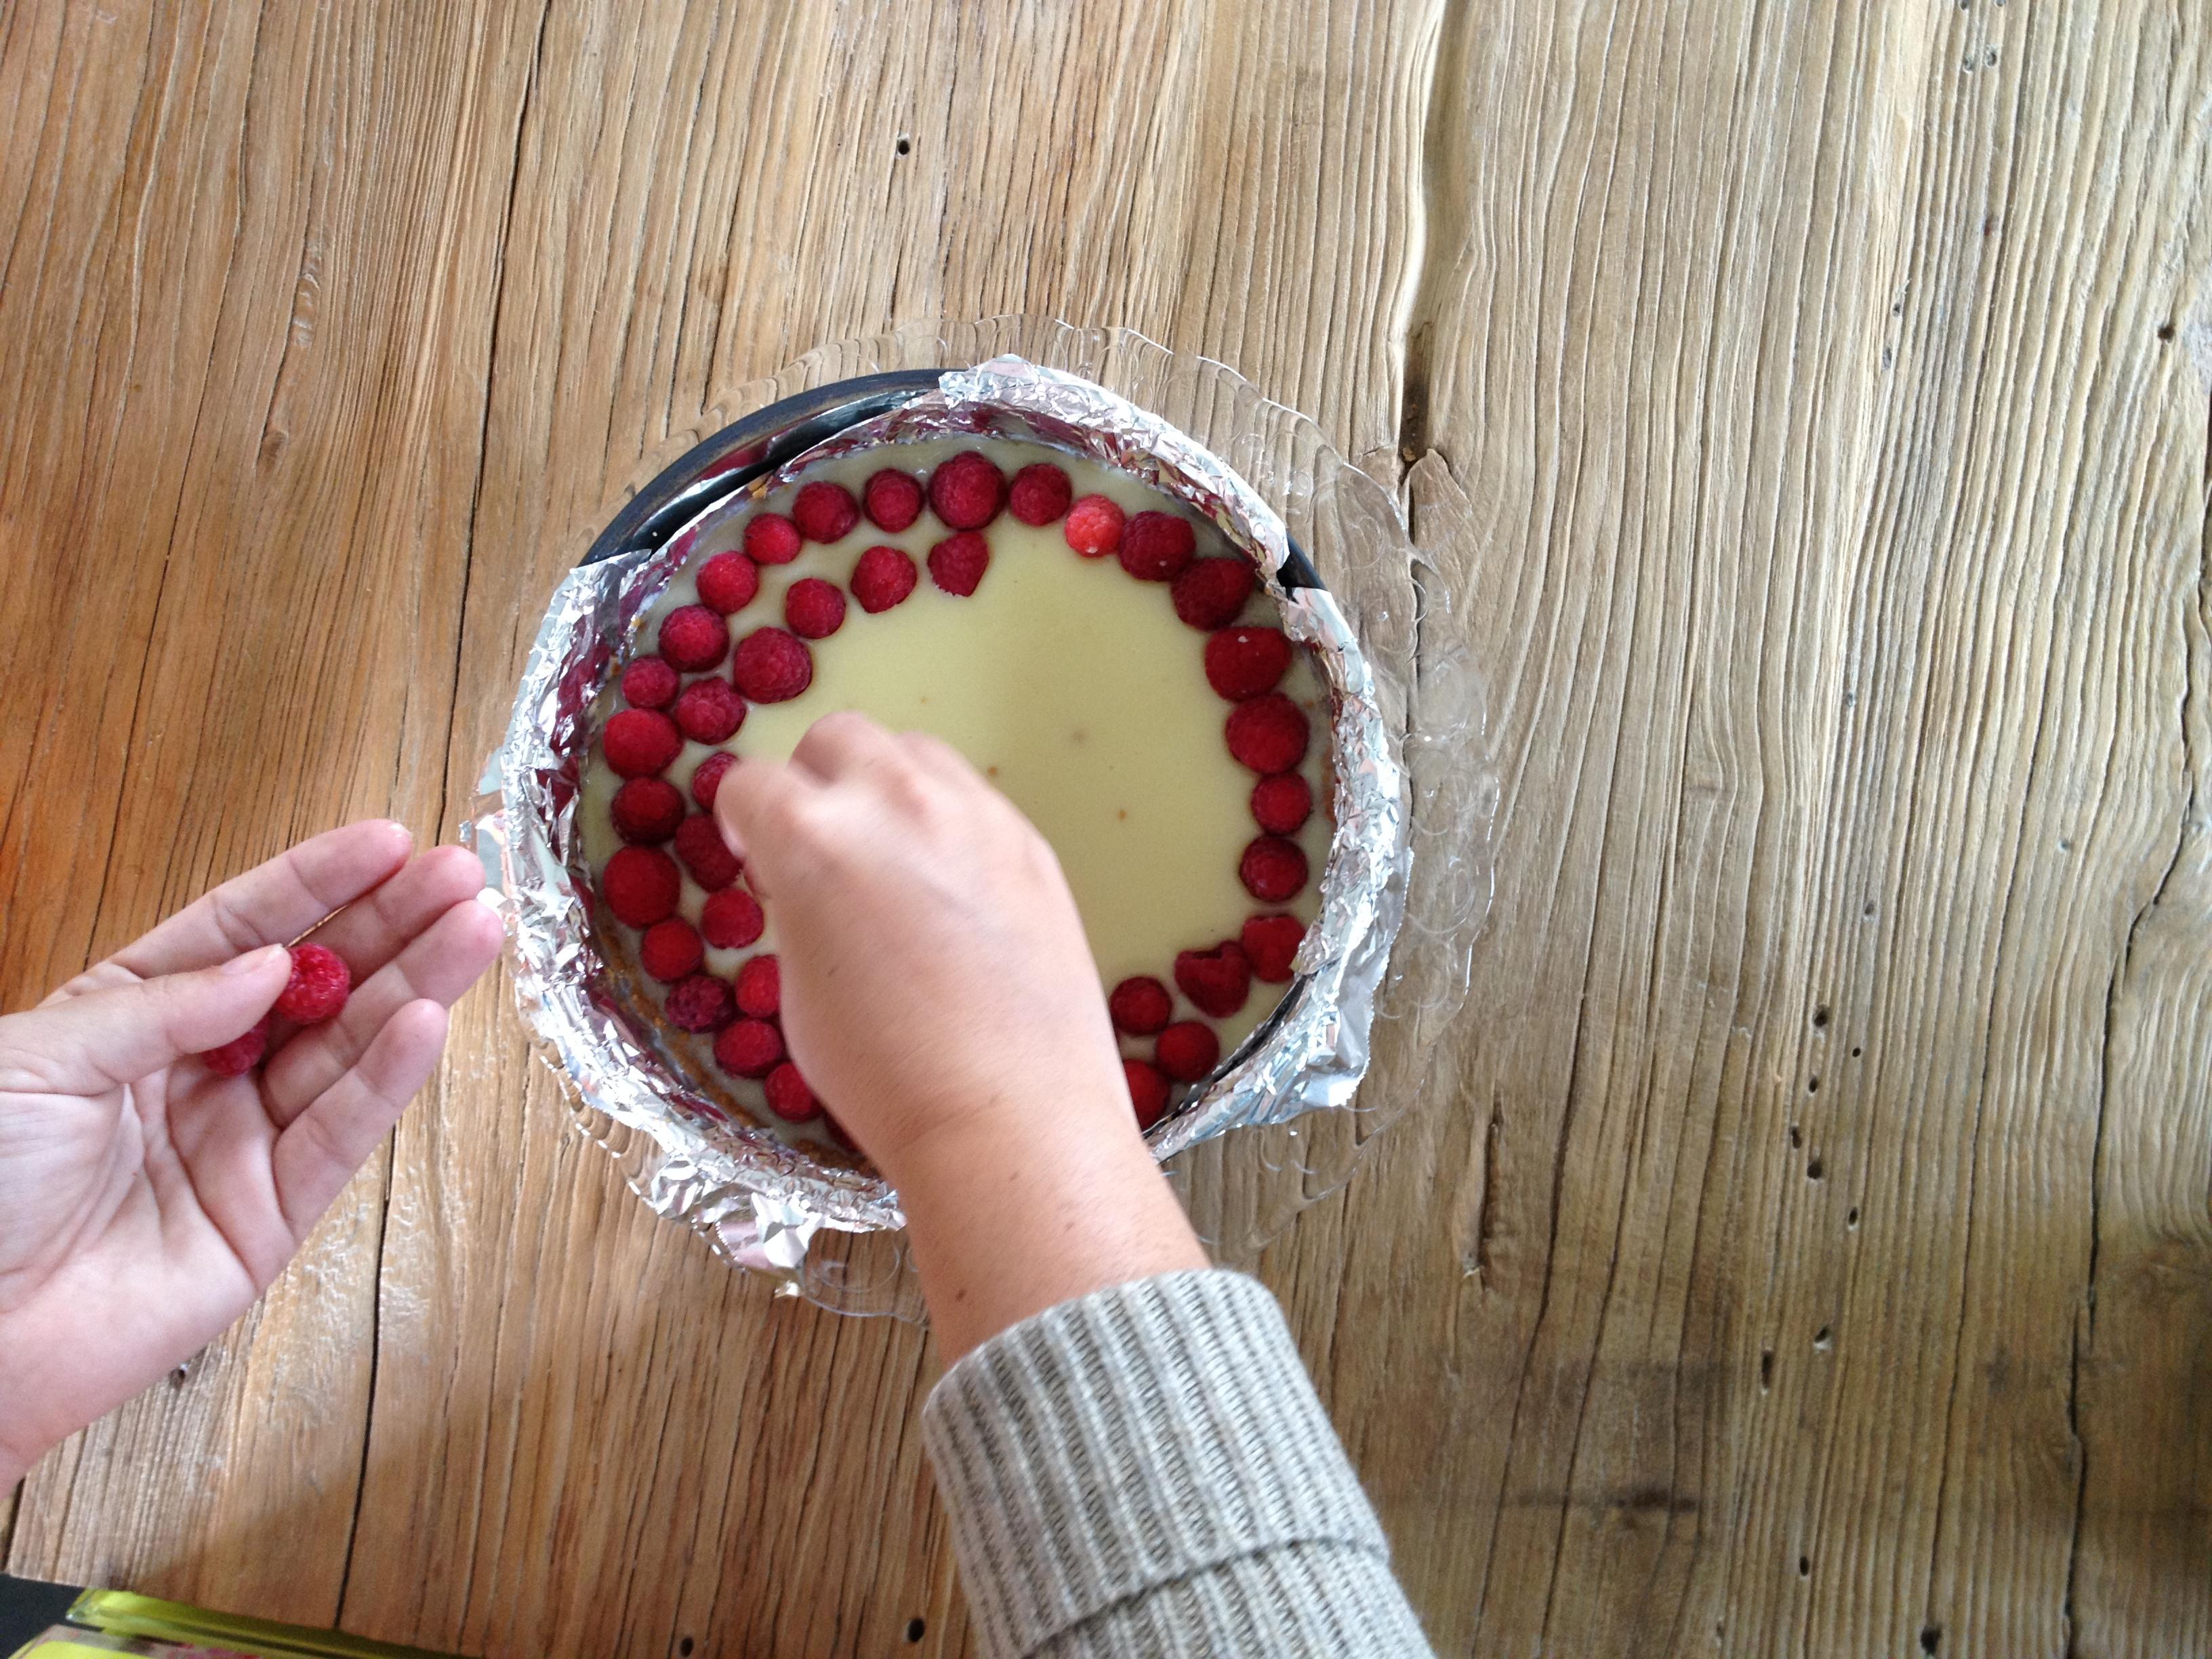 Oui Oui-tarta chocolate blanco y frambuesas-batido frambuesas (2)